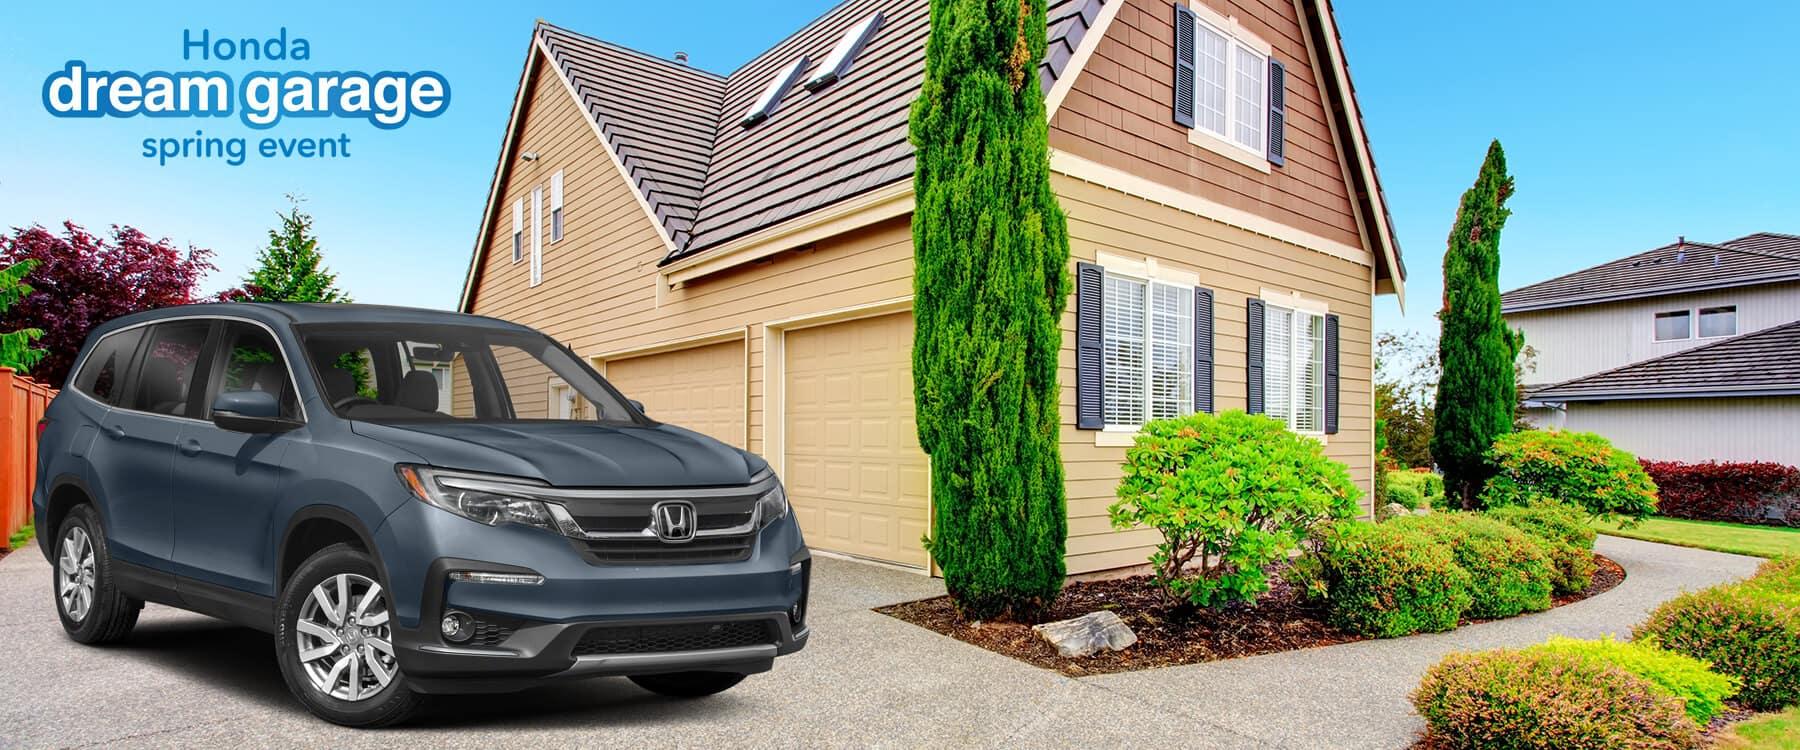 Honda Dream Garage Spring Event 2019 Pilot Slider